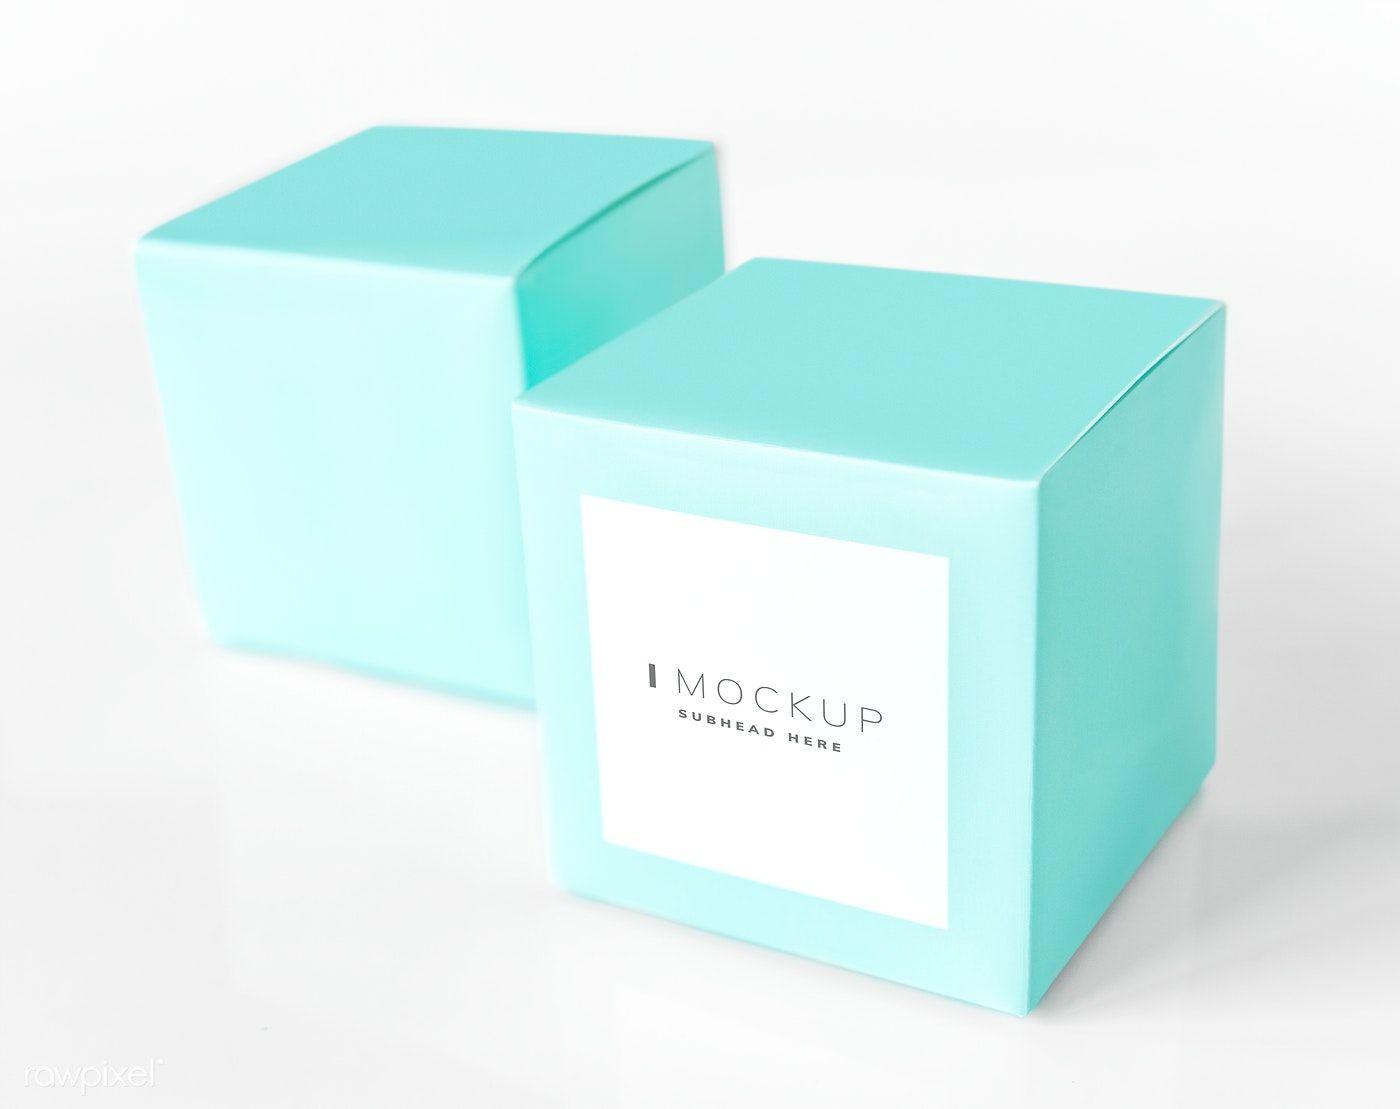 Mint Green Packaging Box Mockup Free Image By Rawpixel Com Ake